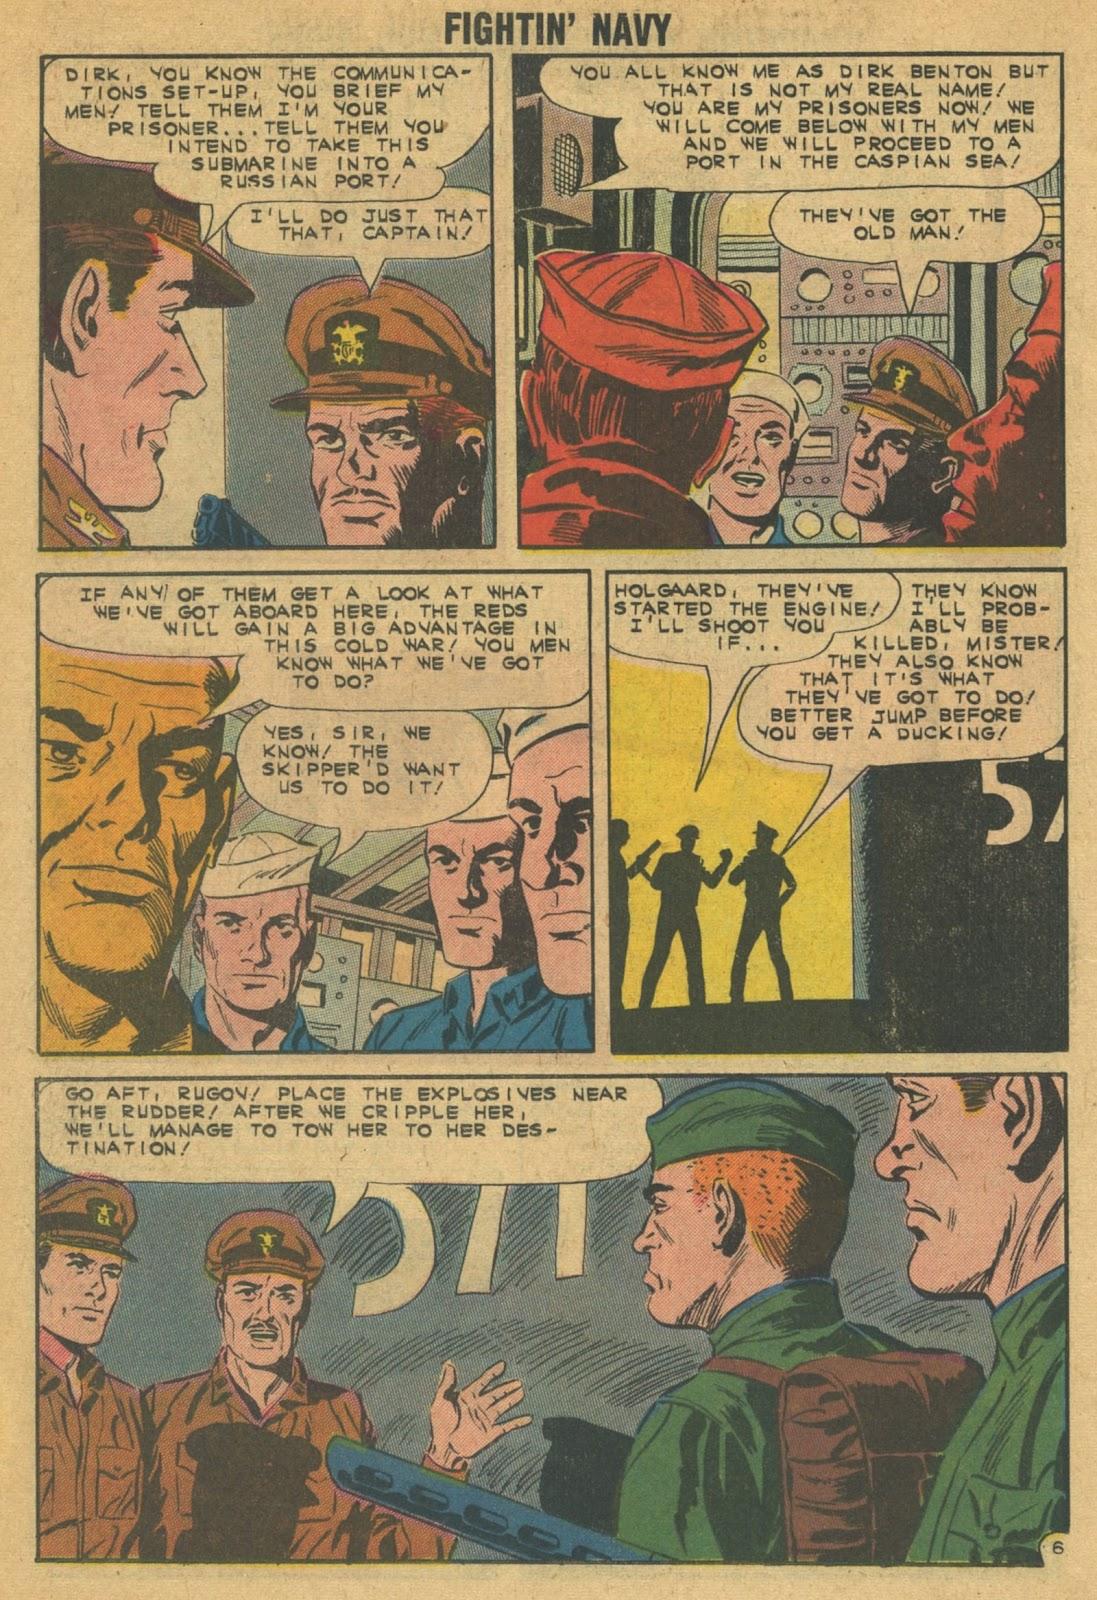 Read online Fightin' Navy comic -  Issue #103 - 18